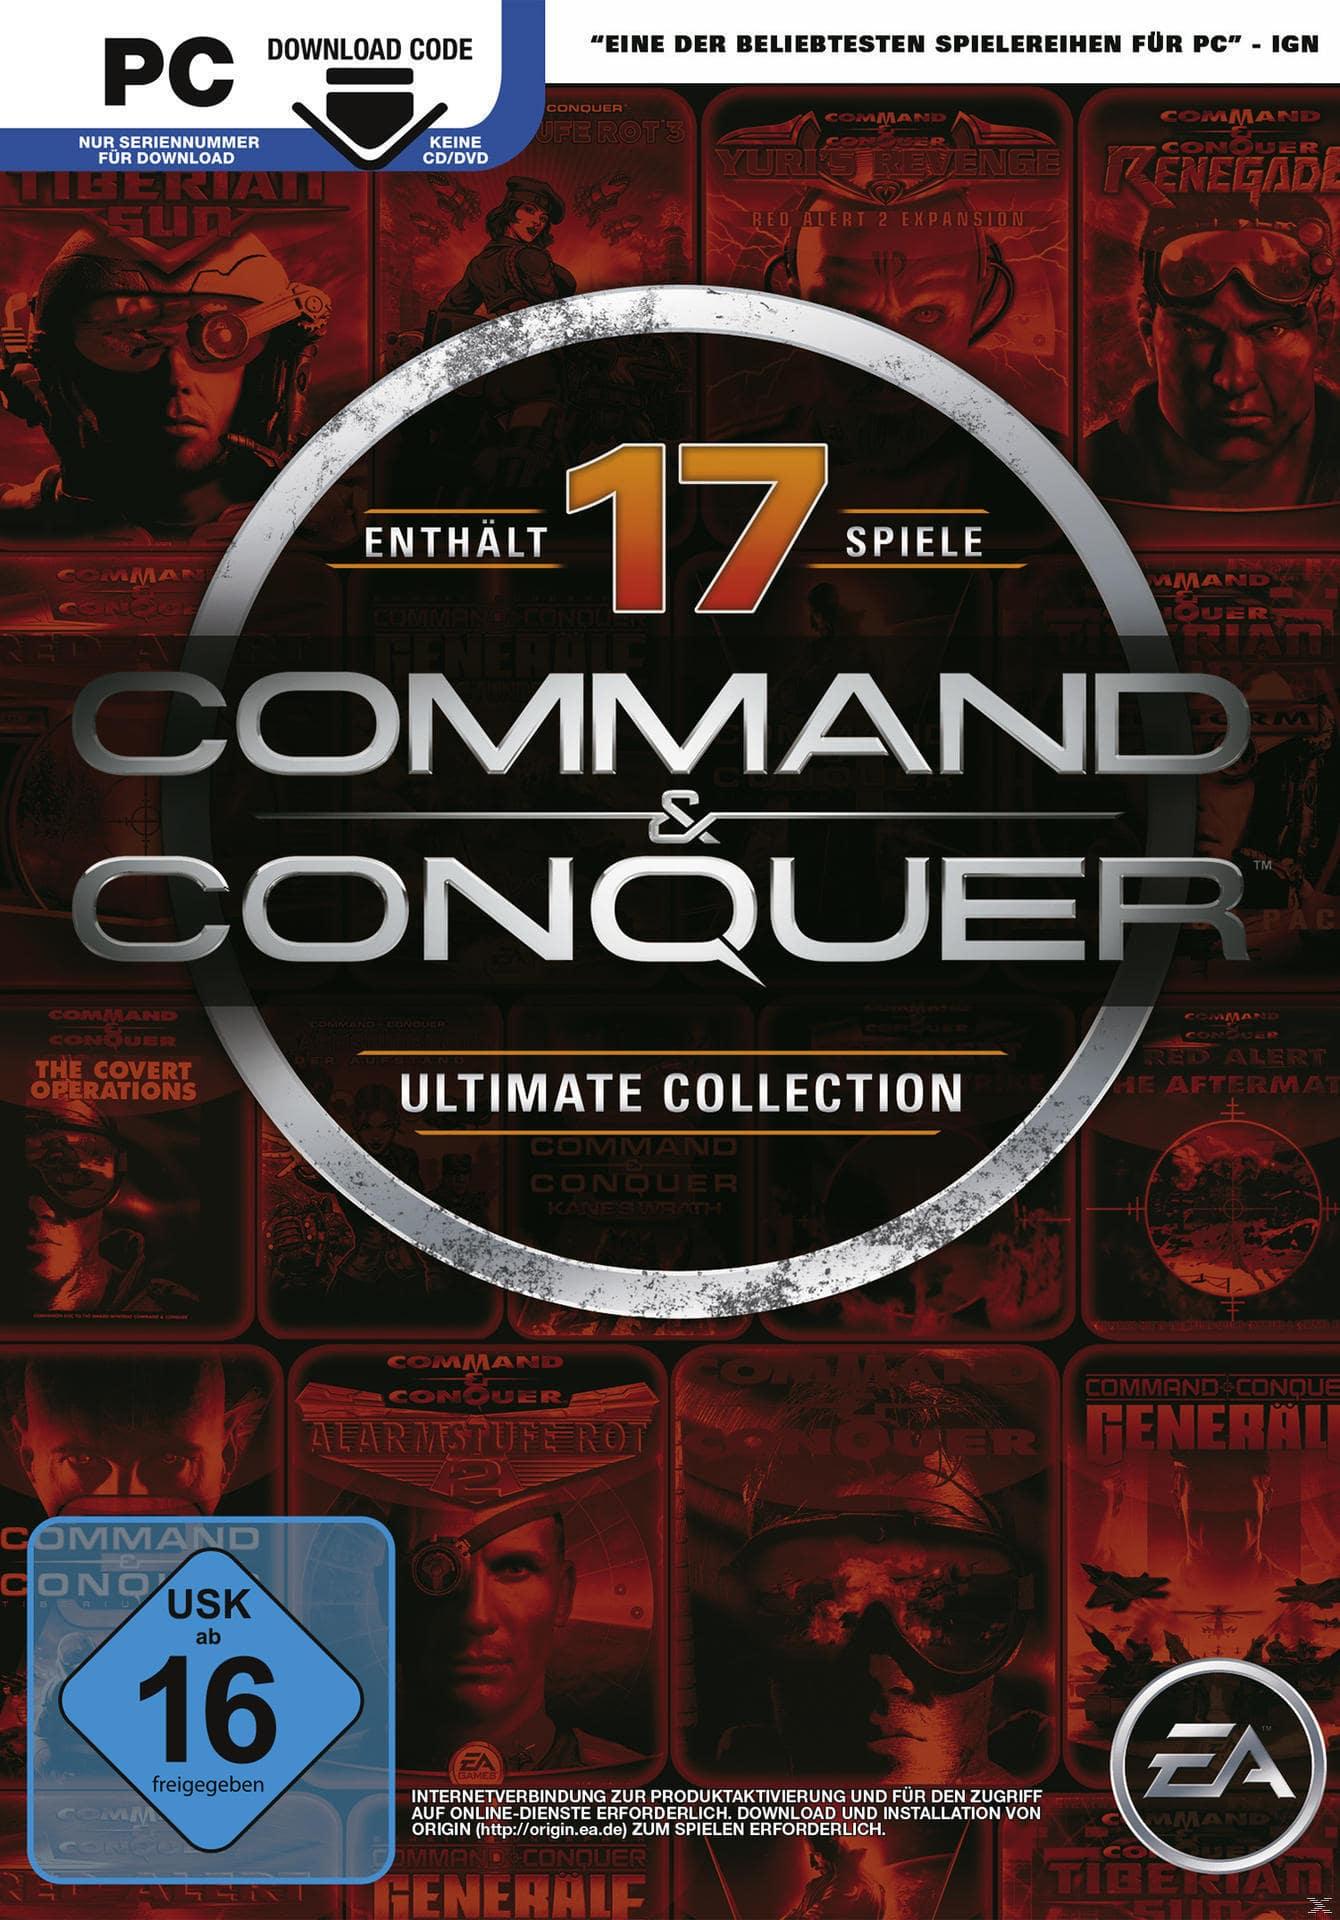 Command & Conquer Ultimate Collection (PC) für 17,46 Euro